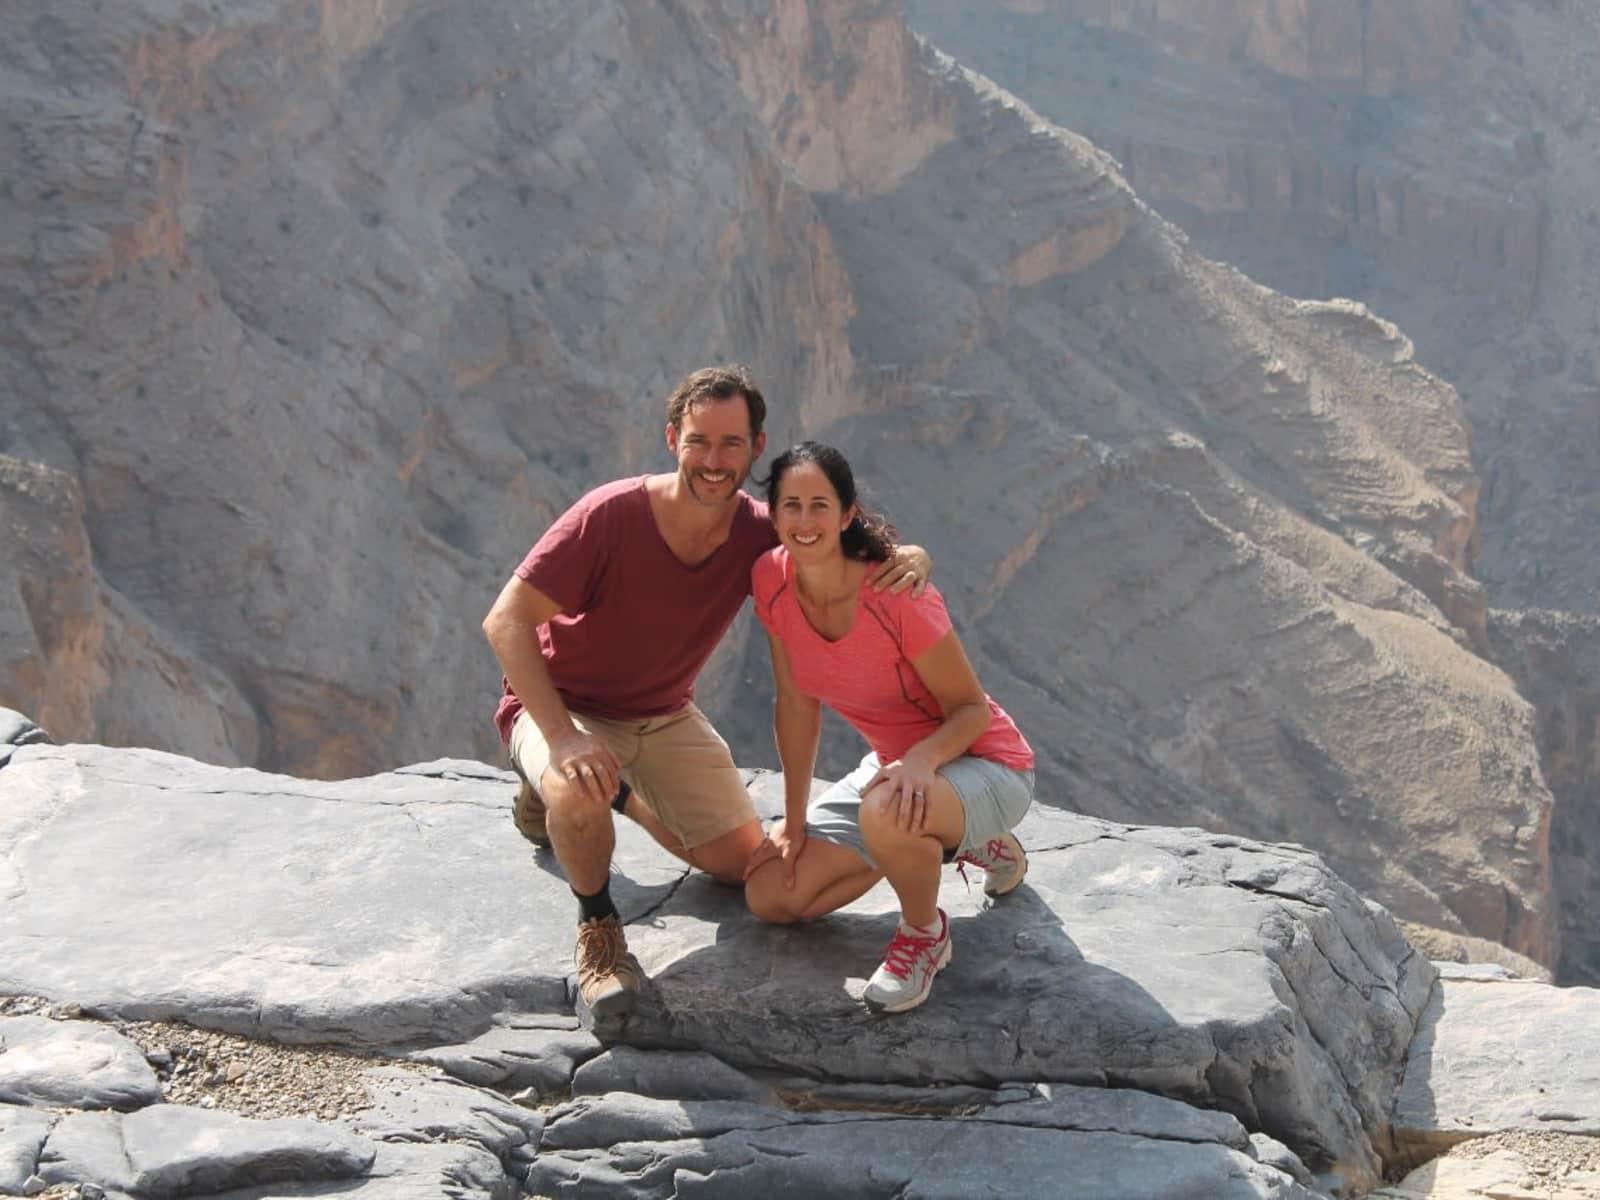 Annette & Andrew from Tallebudgera, Queensland, Australia